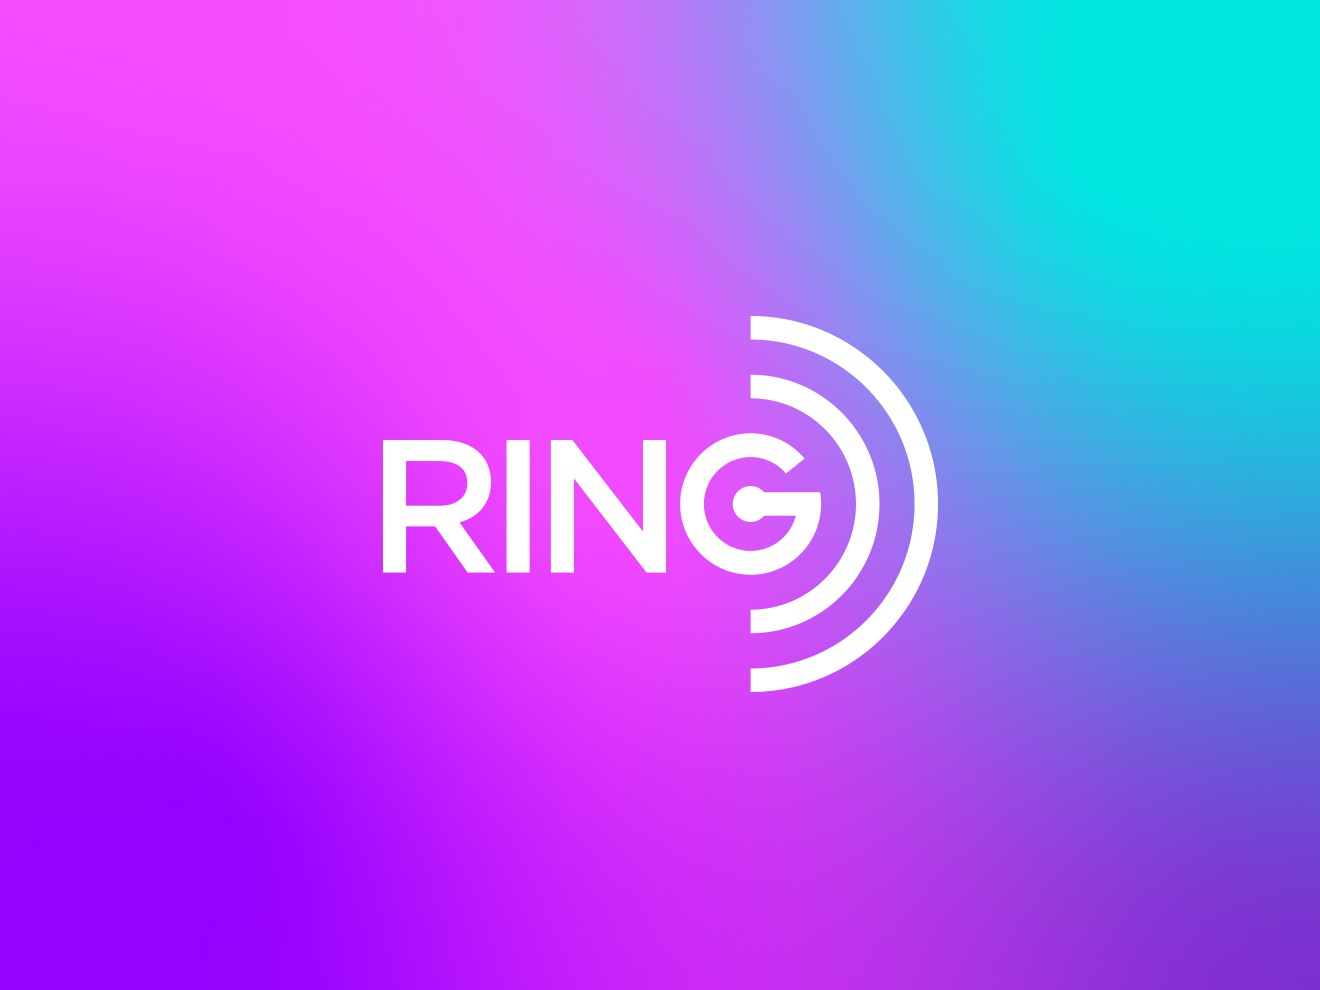 Ring Logo Design logomark app icon symbol logo icon logos symbol